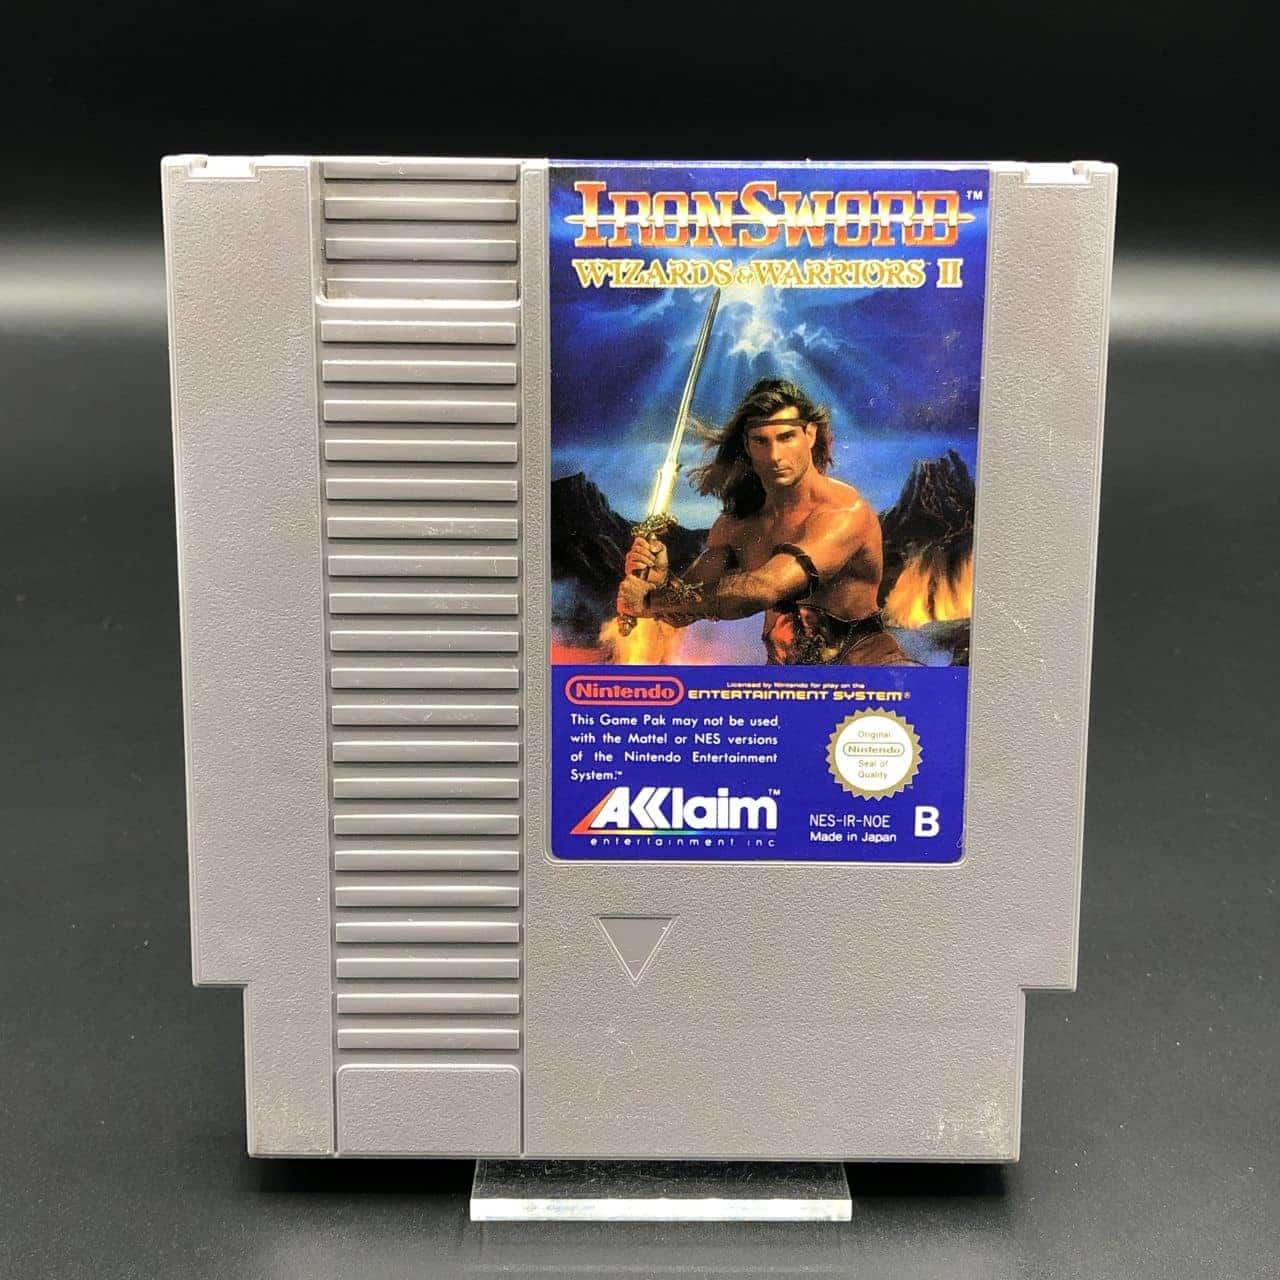 NES Ironsword: Wizards & Warriors II (Modul) (Gut) Nintendo Entertainment System #1